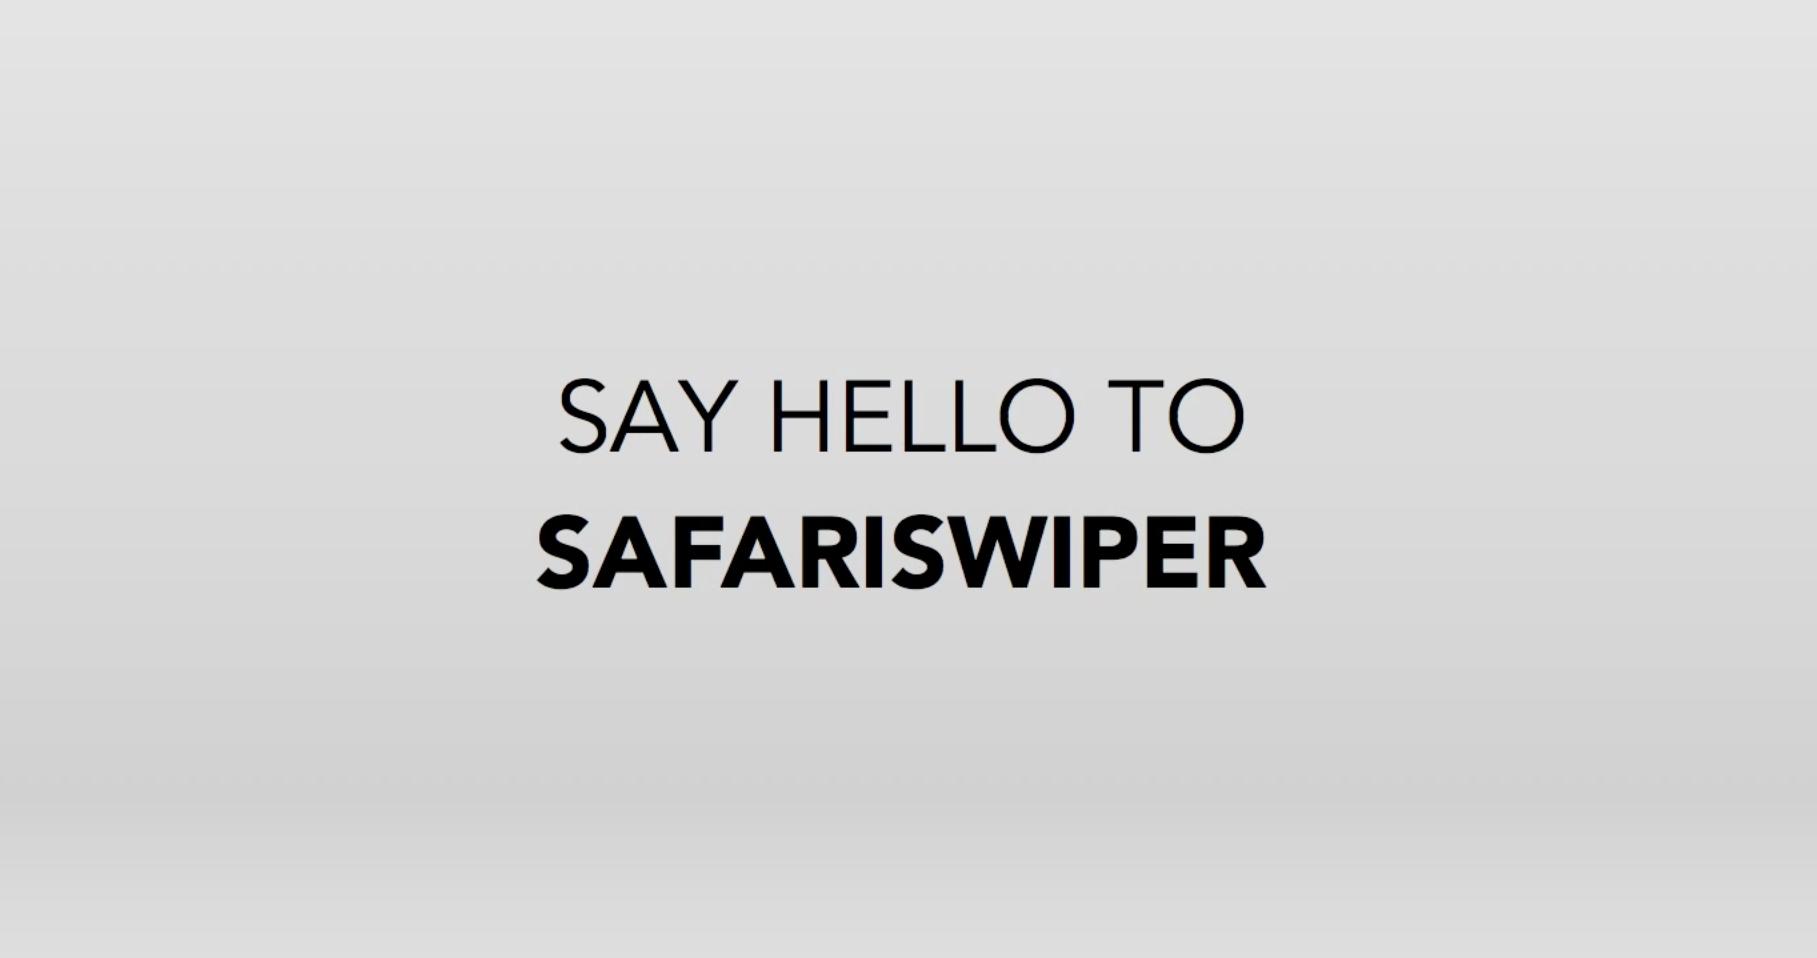 SafariSwiper Cydia : SafariSwiper, ou comment changer facilement donglet dans Safari